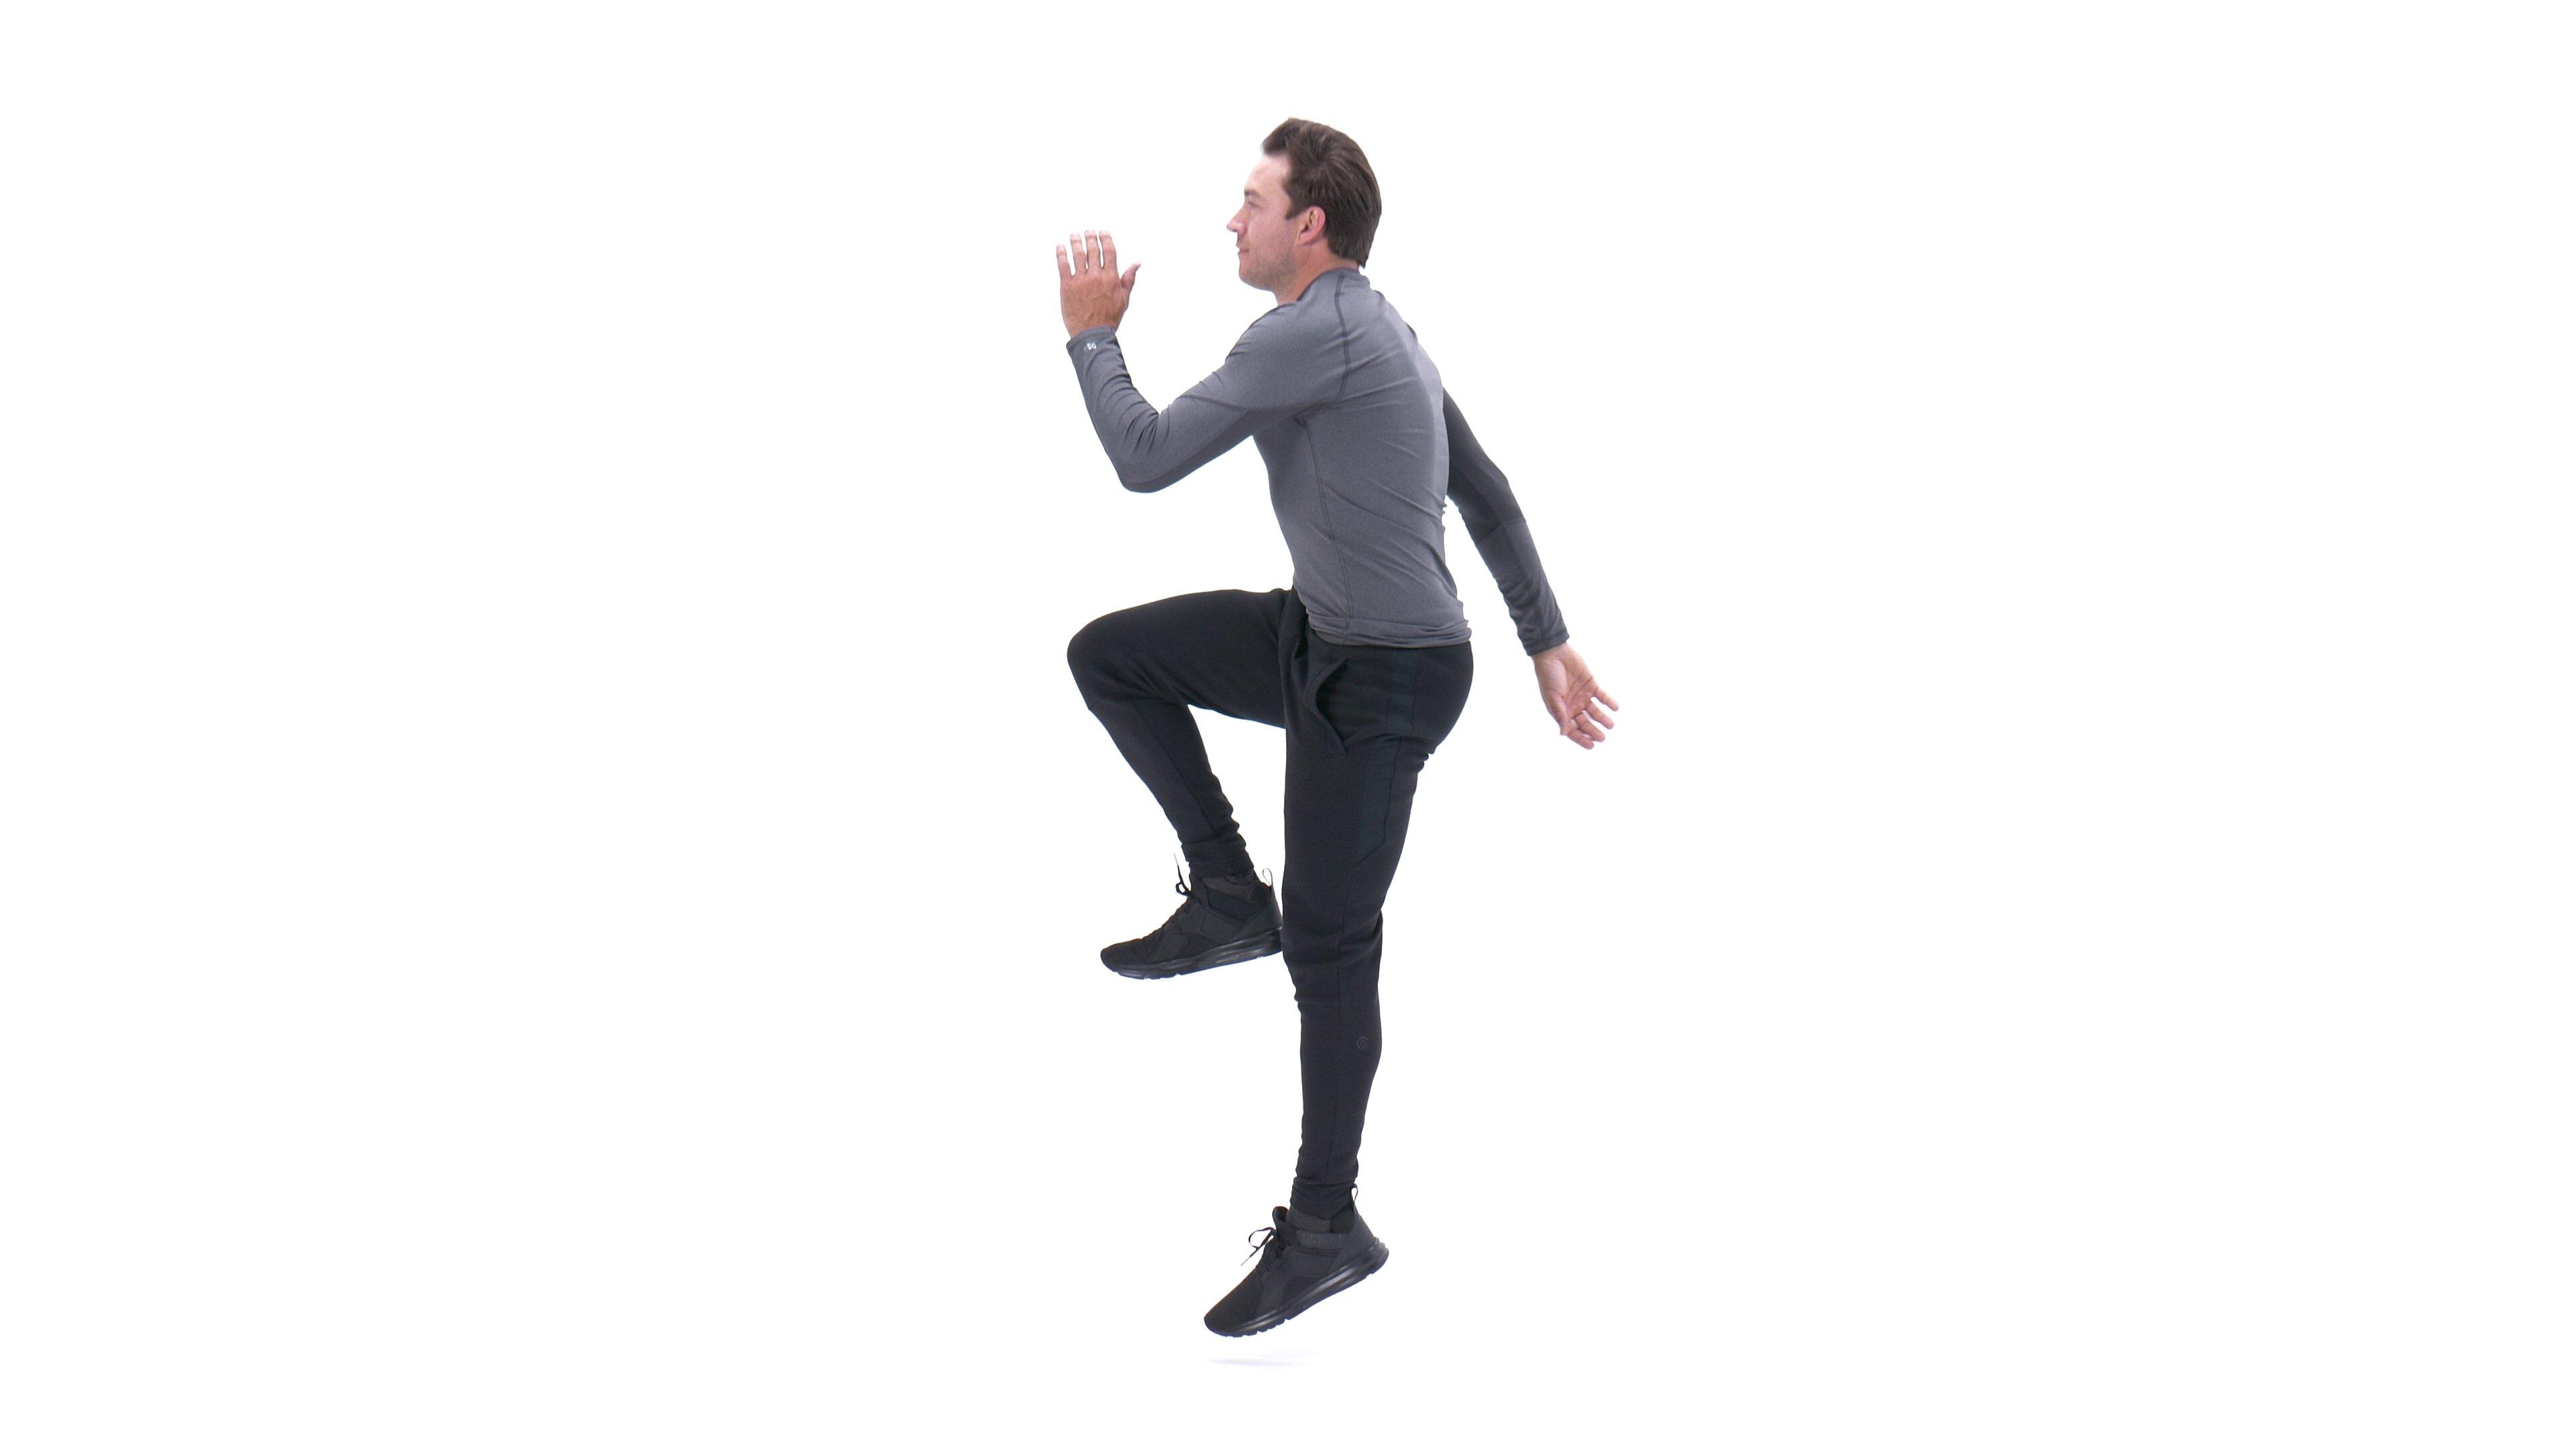 Running lunge image